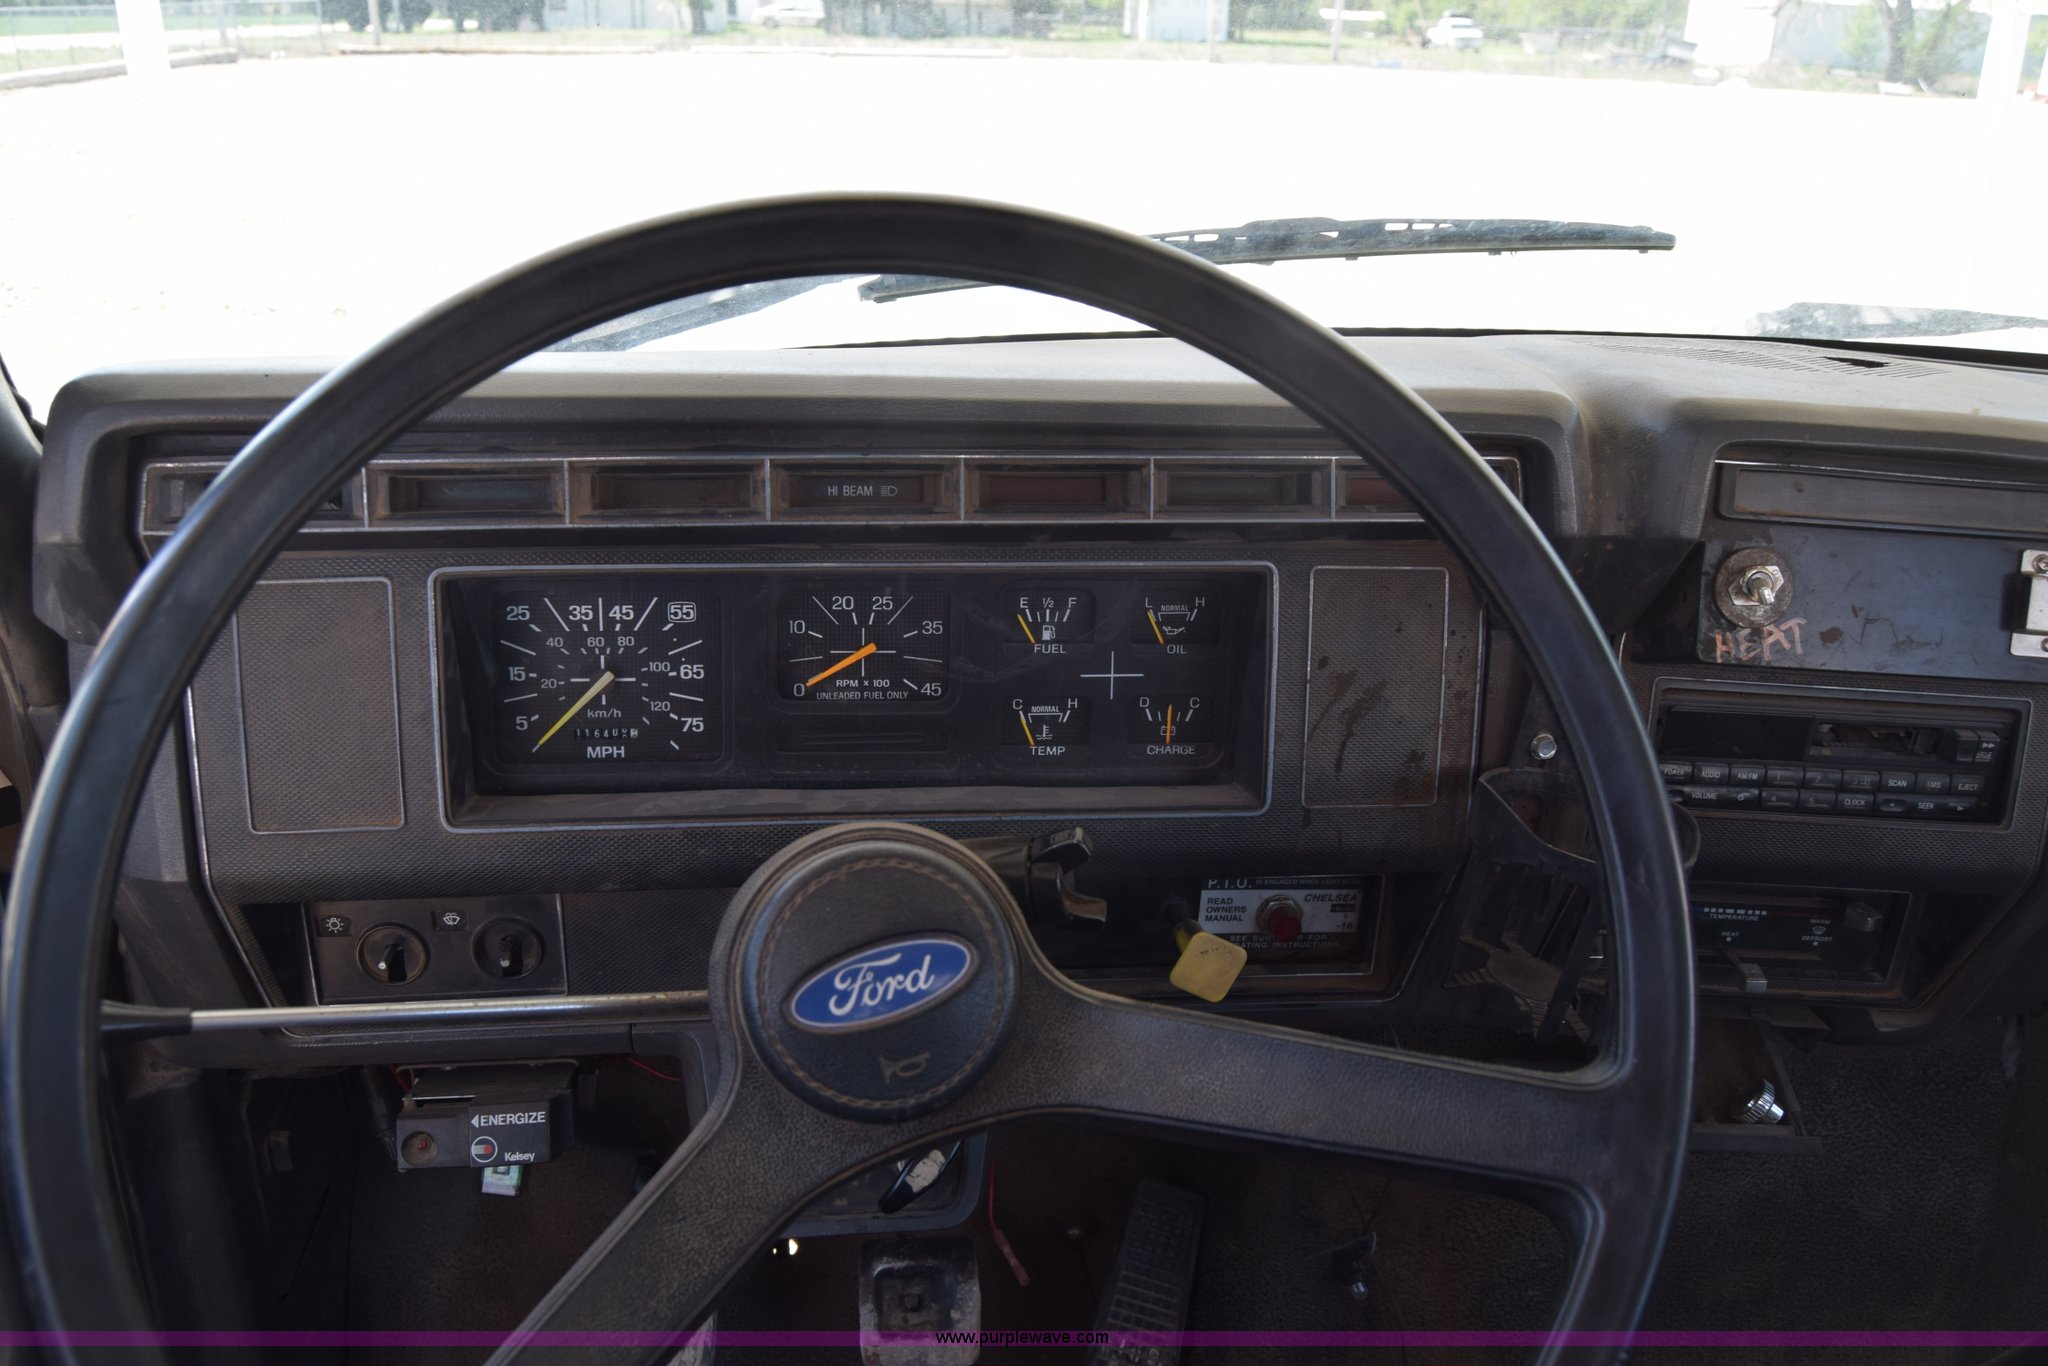 Kelsey Brake Controller Best 2018. Jeep Trailer Brake Controller Wiring Diagram Auto. Wiring. Kelsey Hayes No 81739 Wiring Diagram At Scoala.co